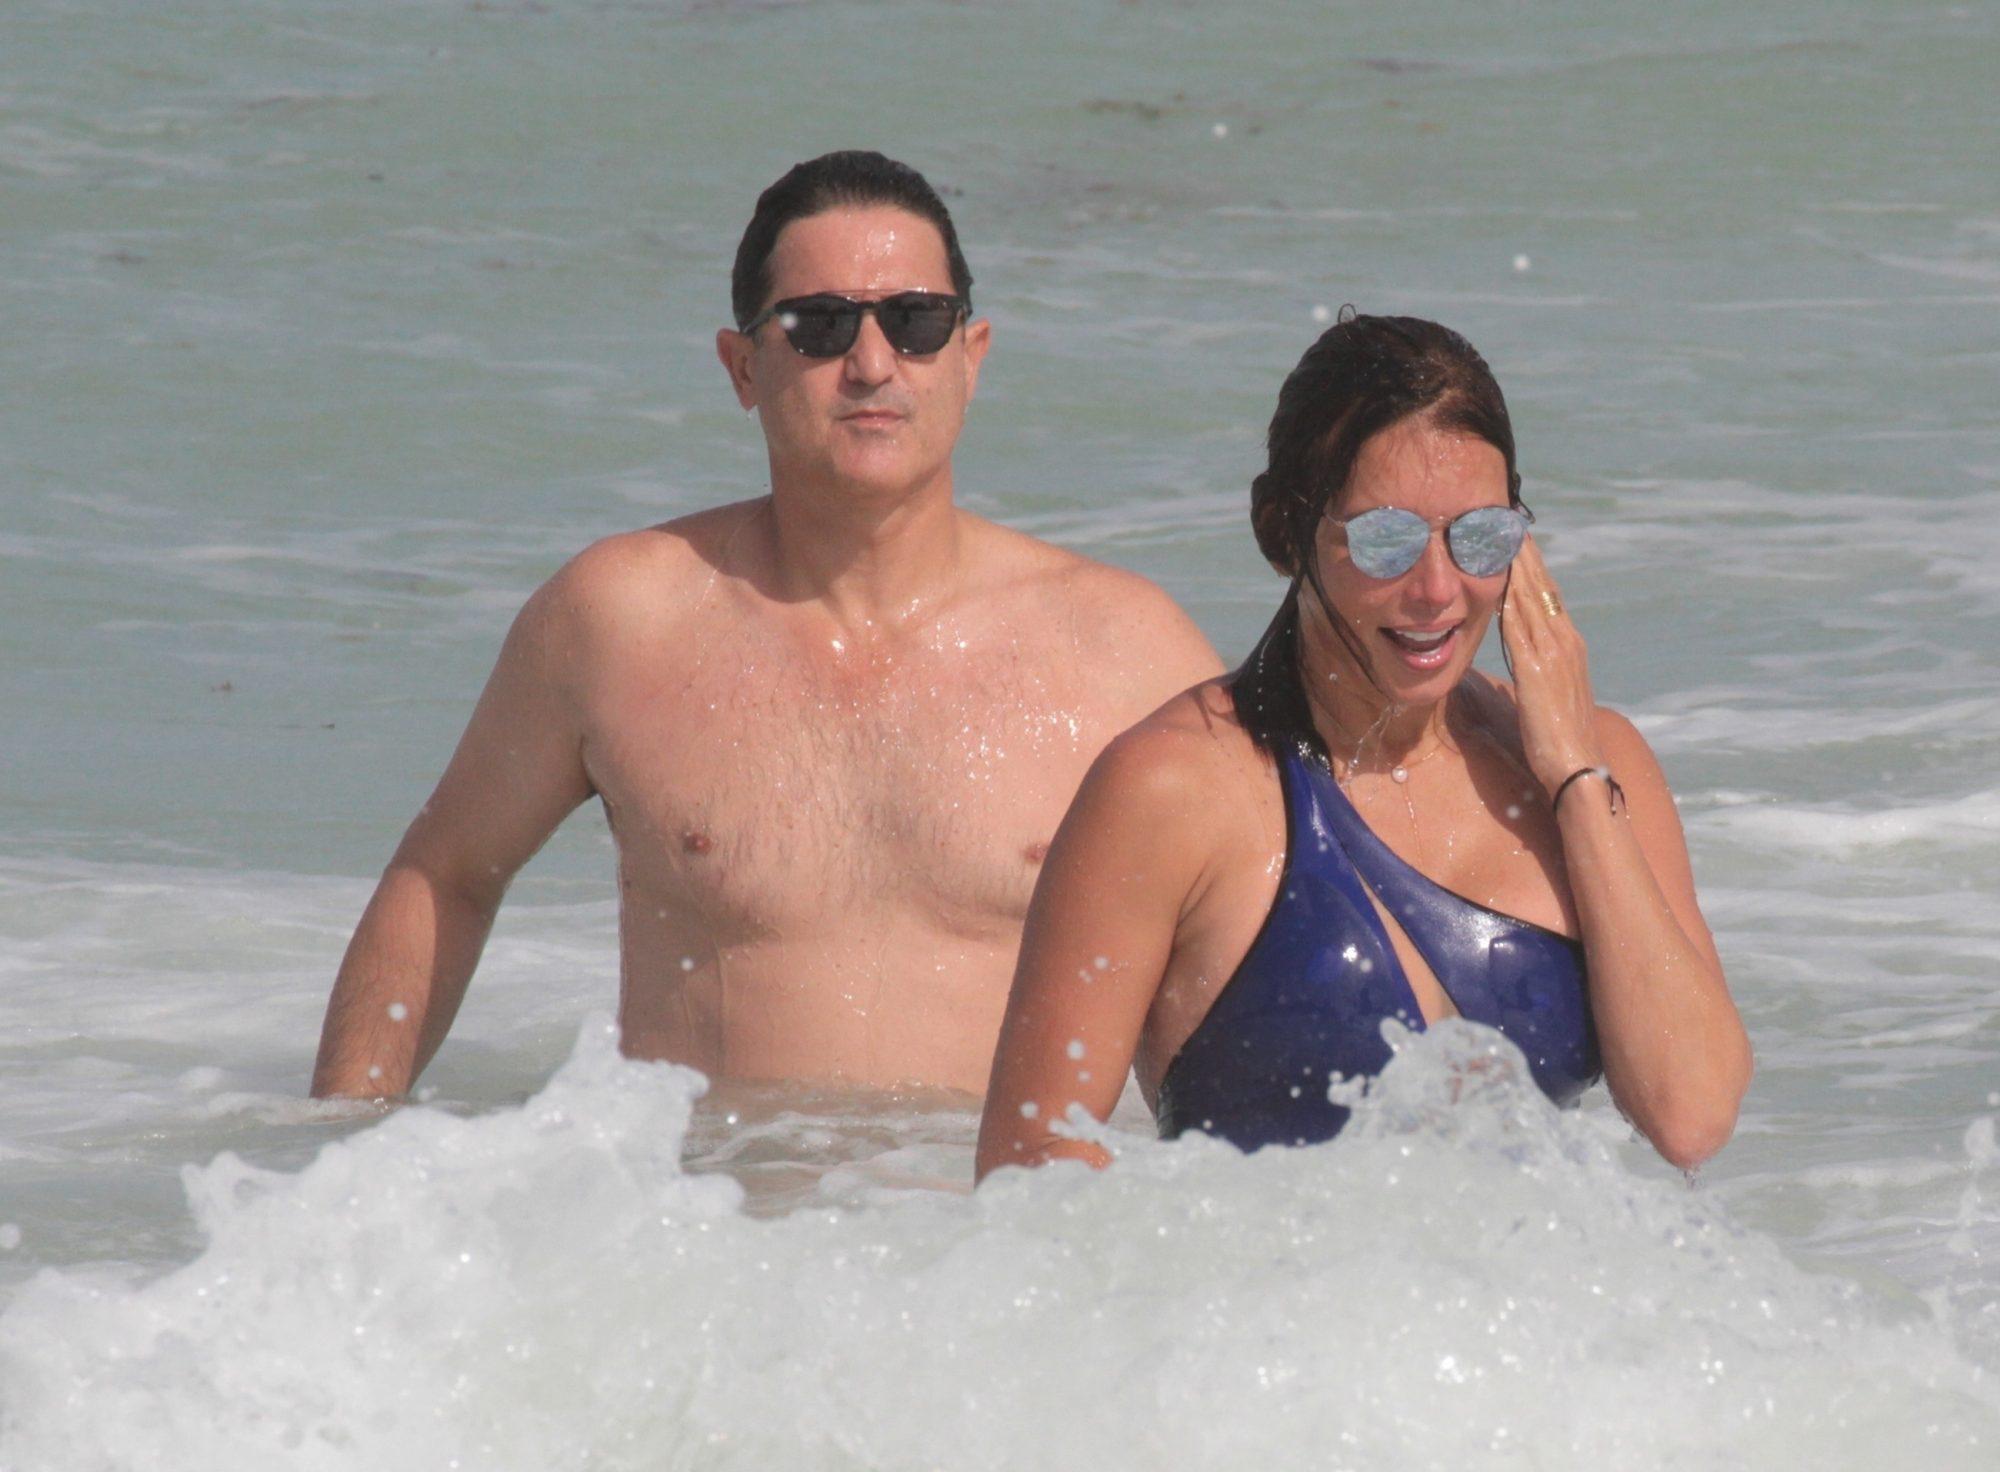 Giselle Blondet y su novio Jaime Fernandez